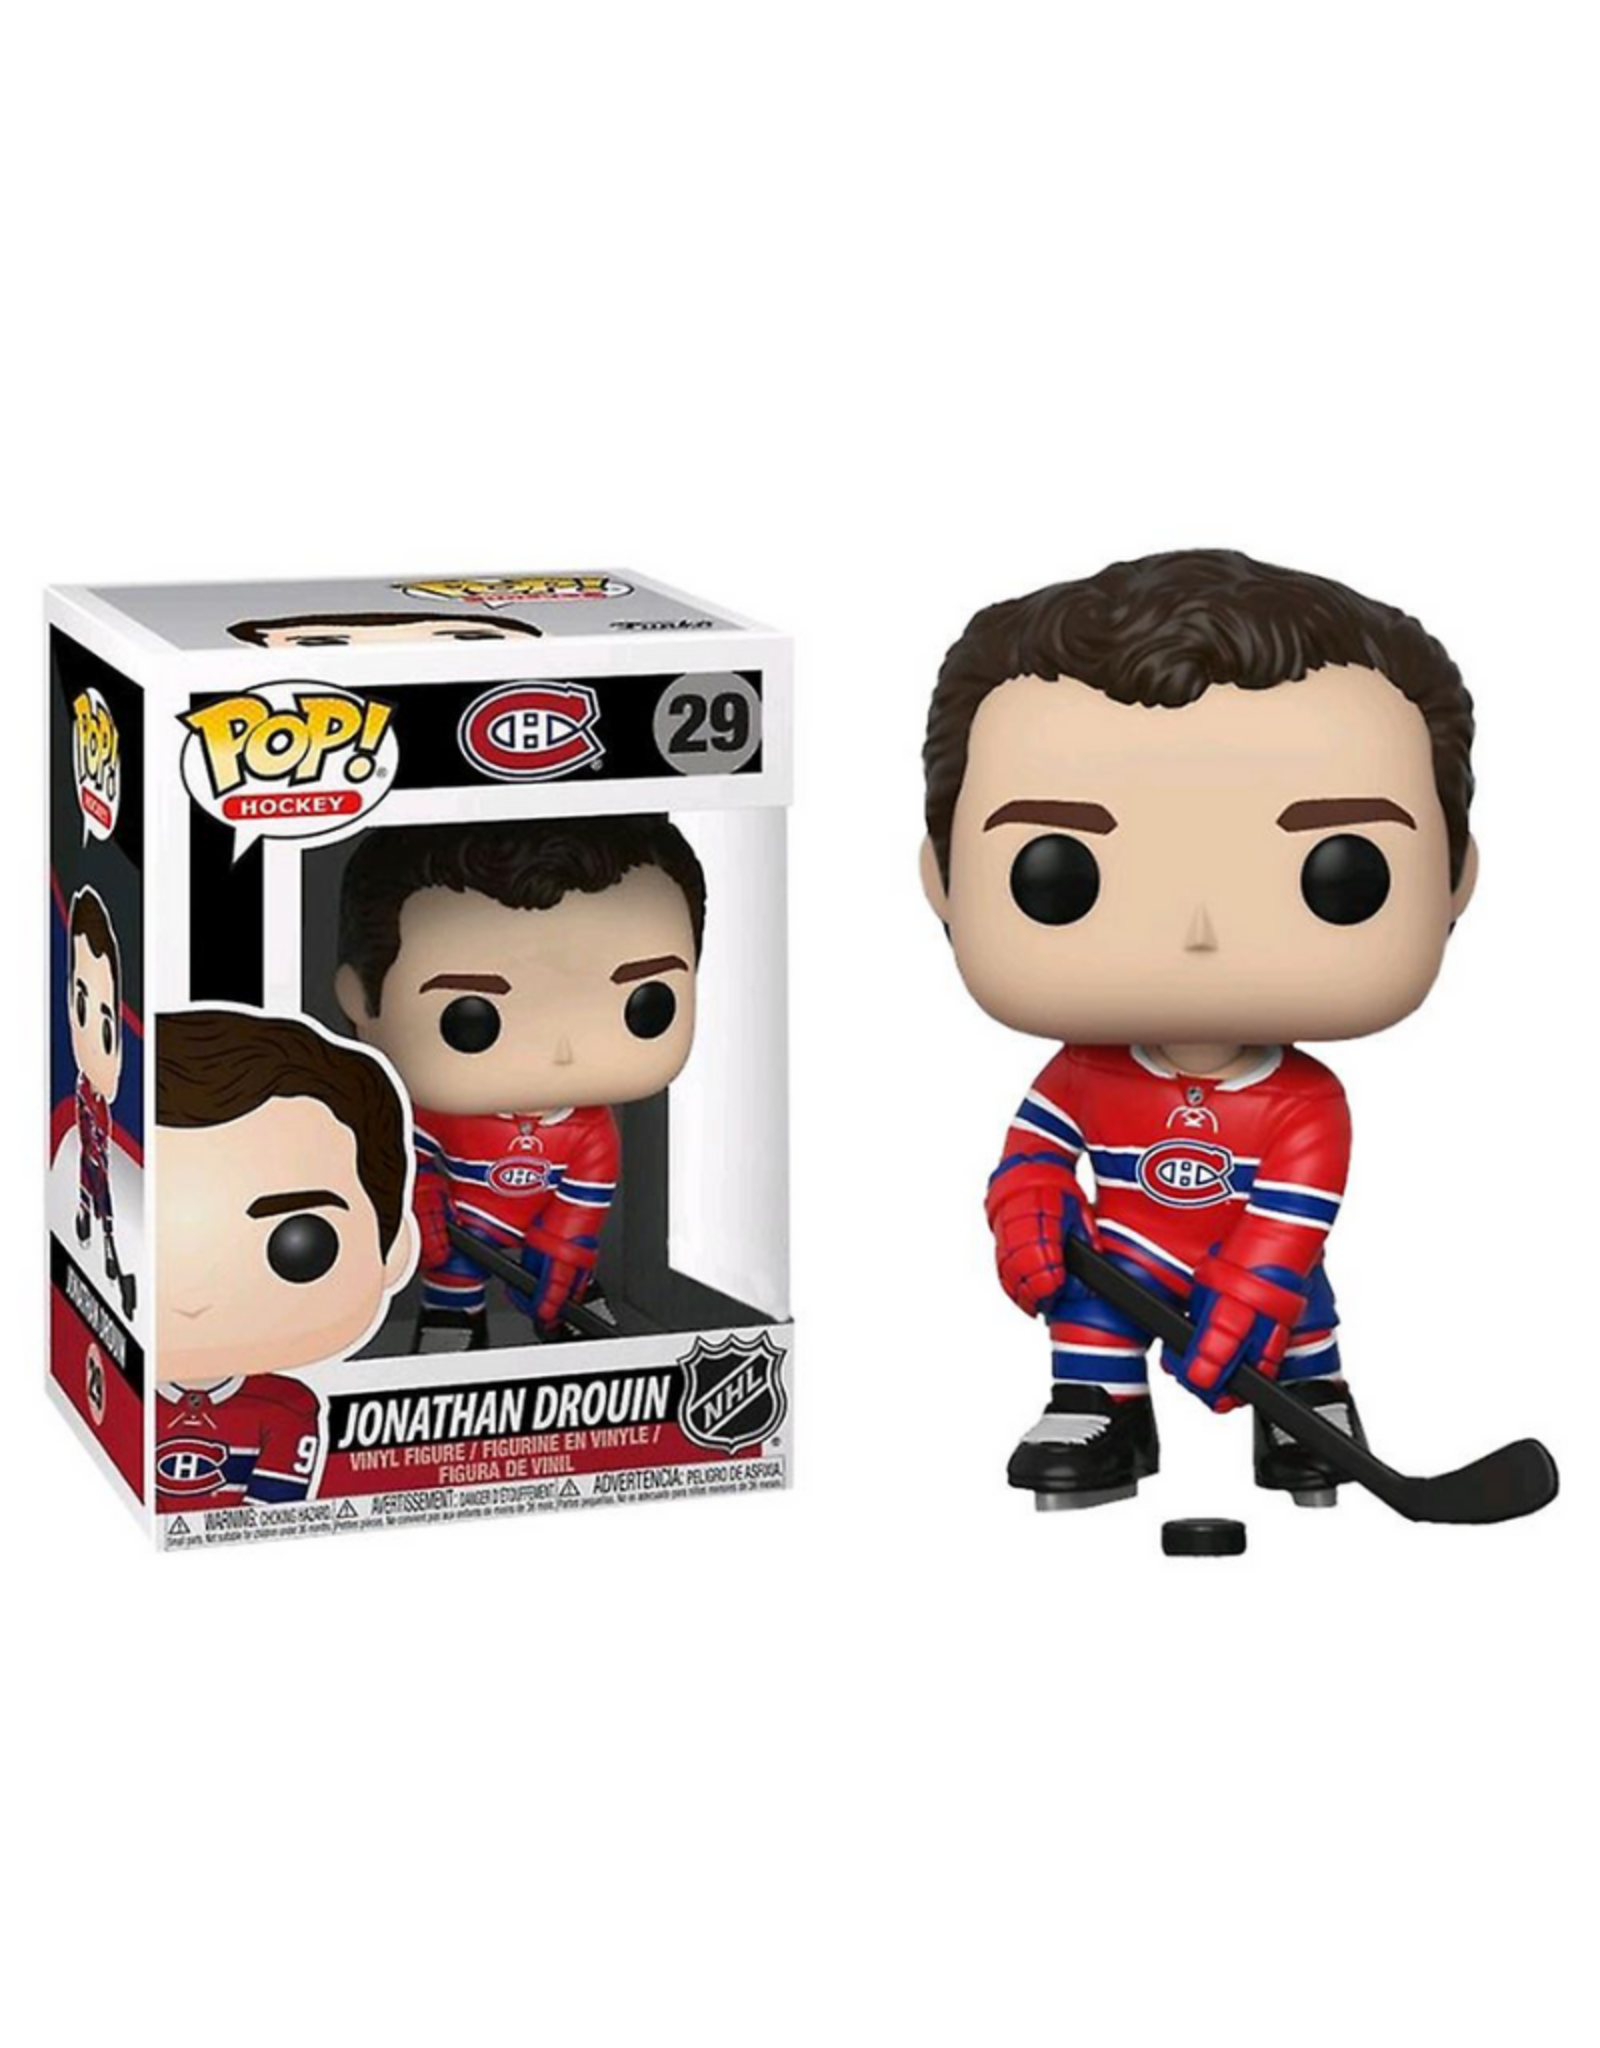 Funko POP! Figure Drouin Montreal Canadiens Red